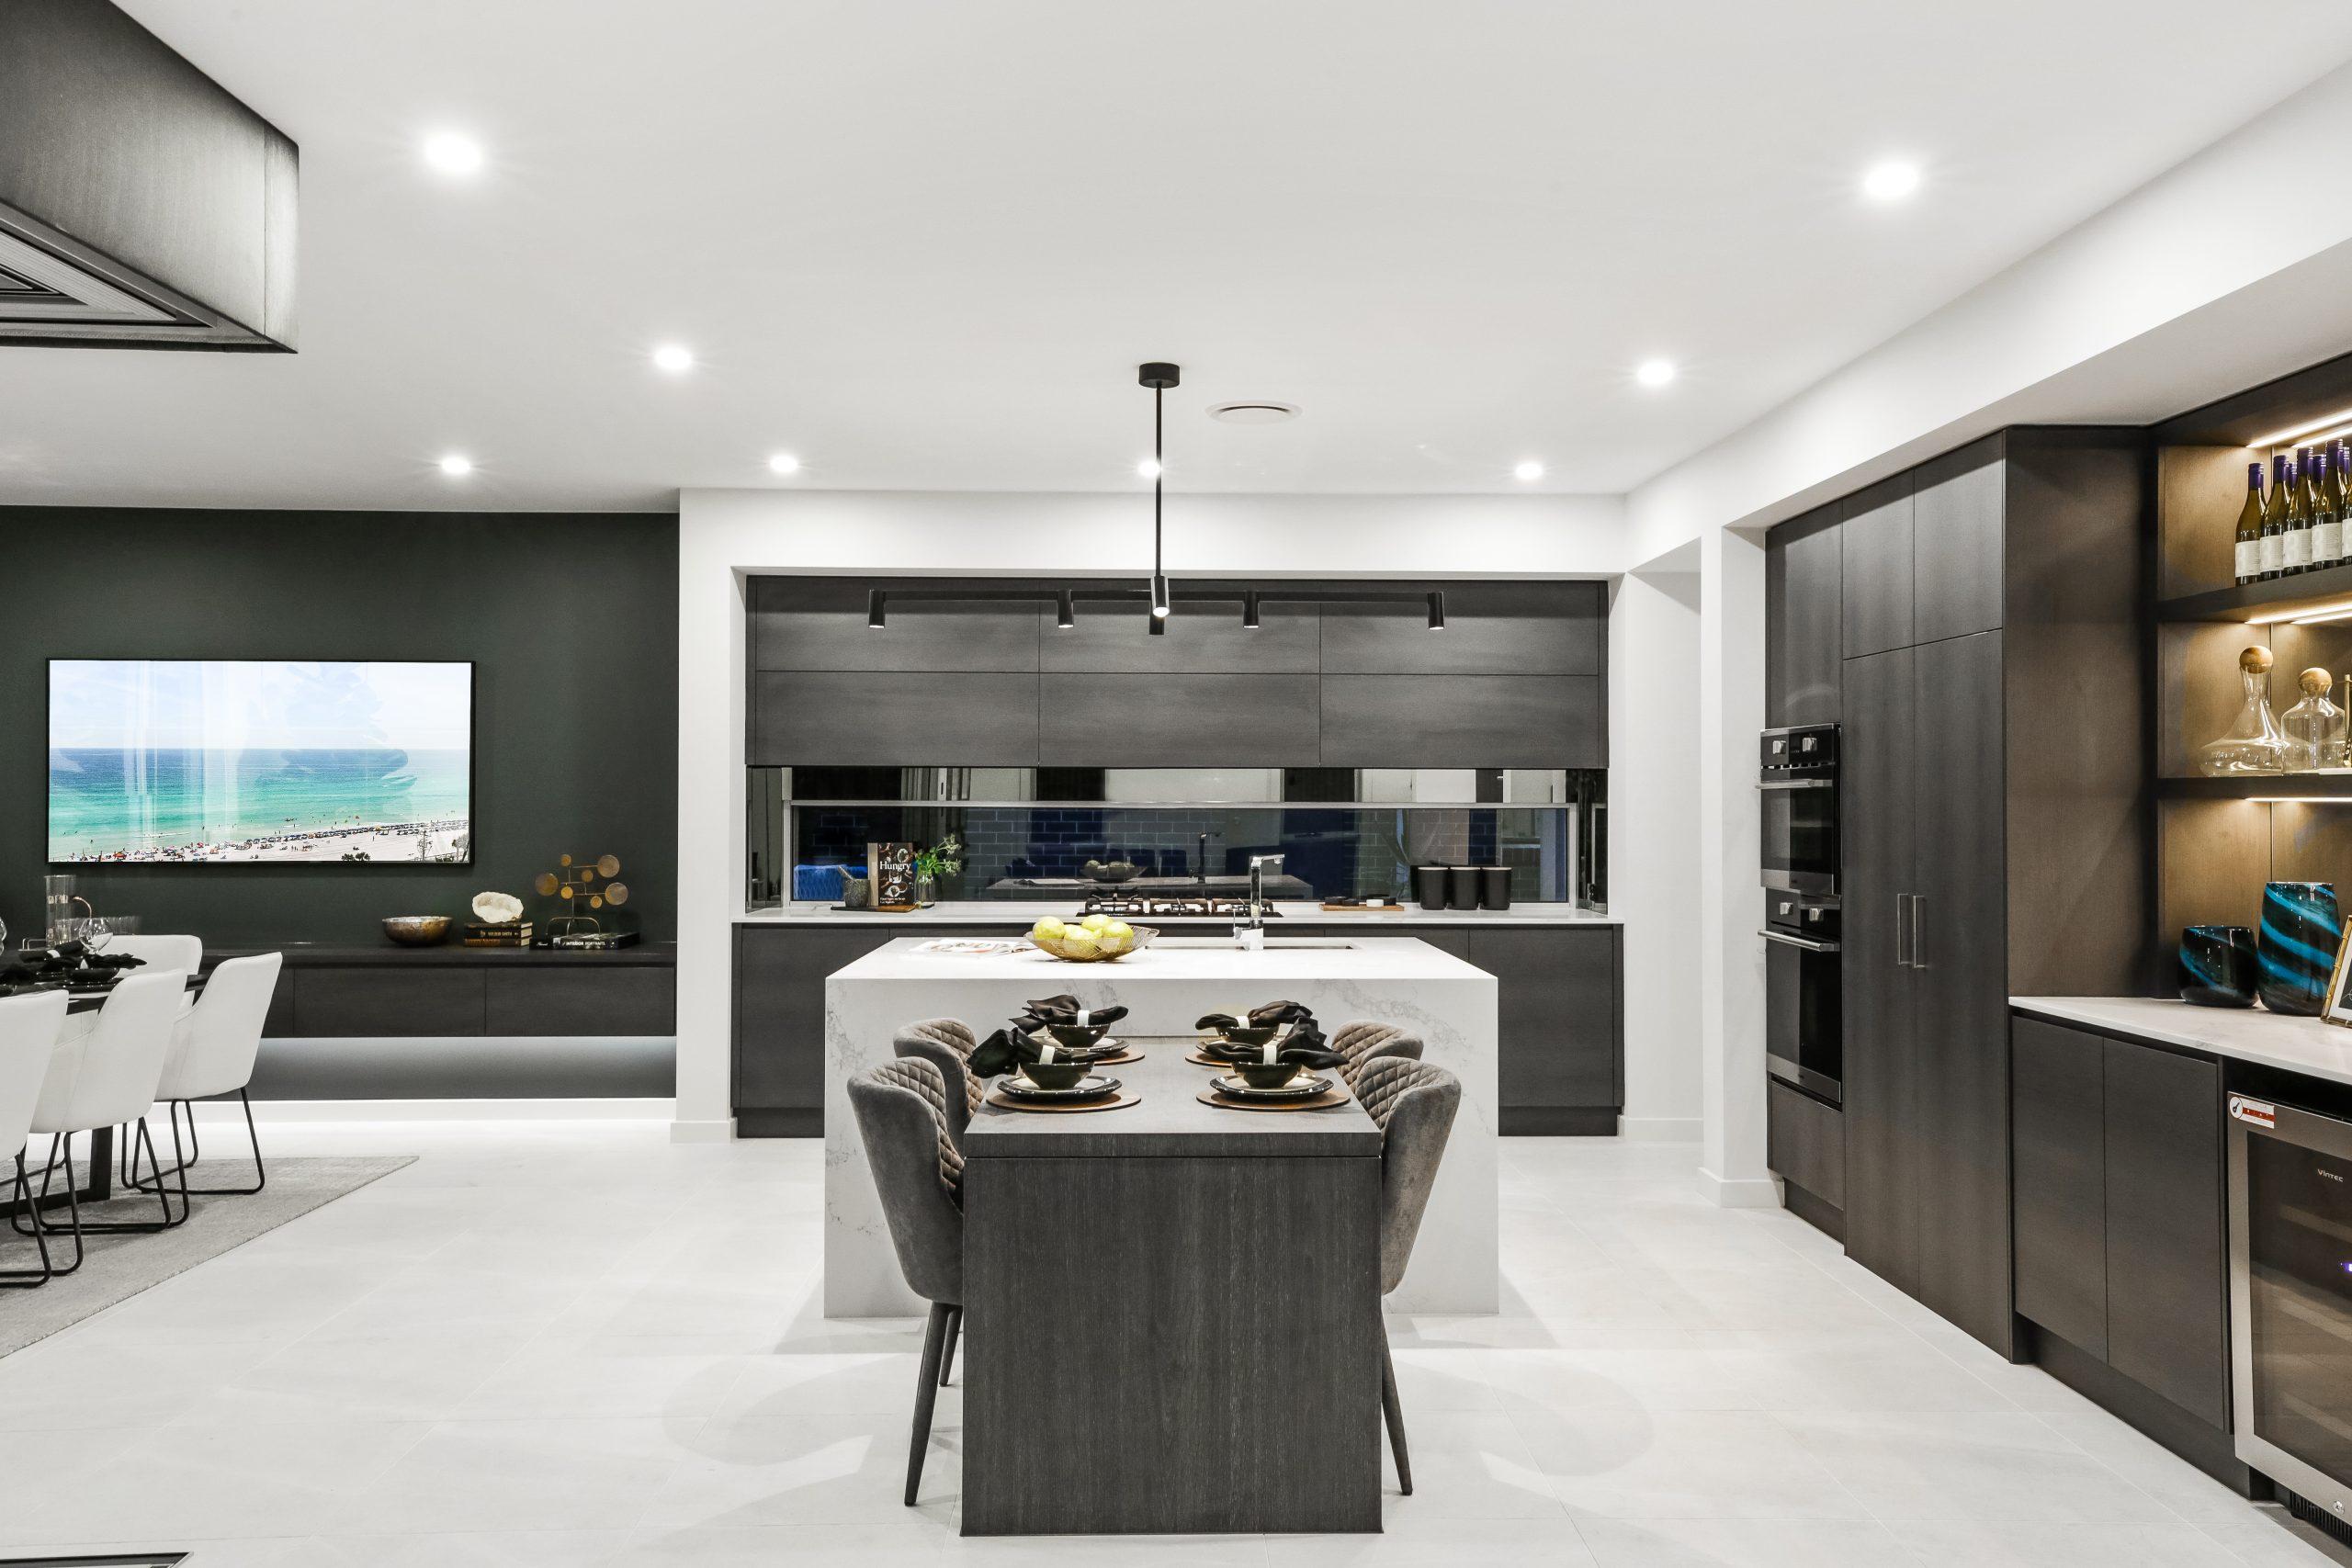 highres-15 Interior